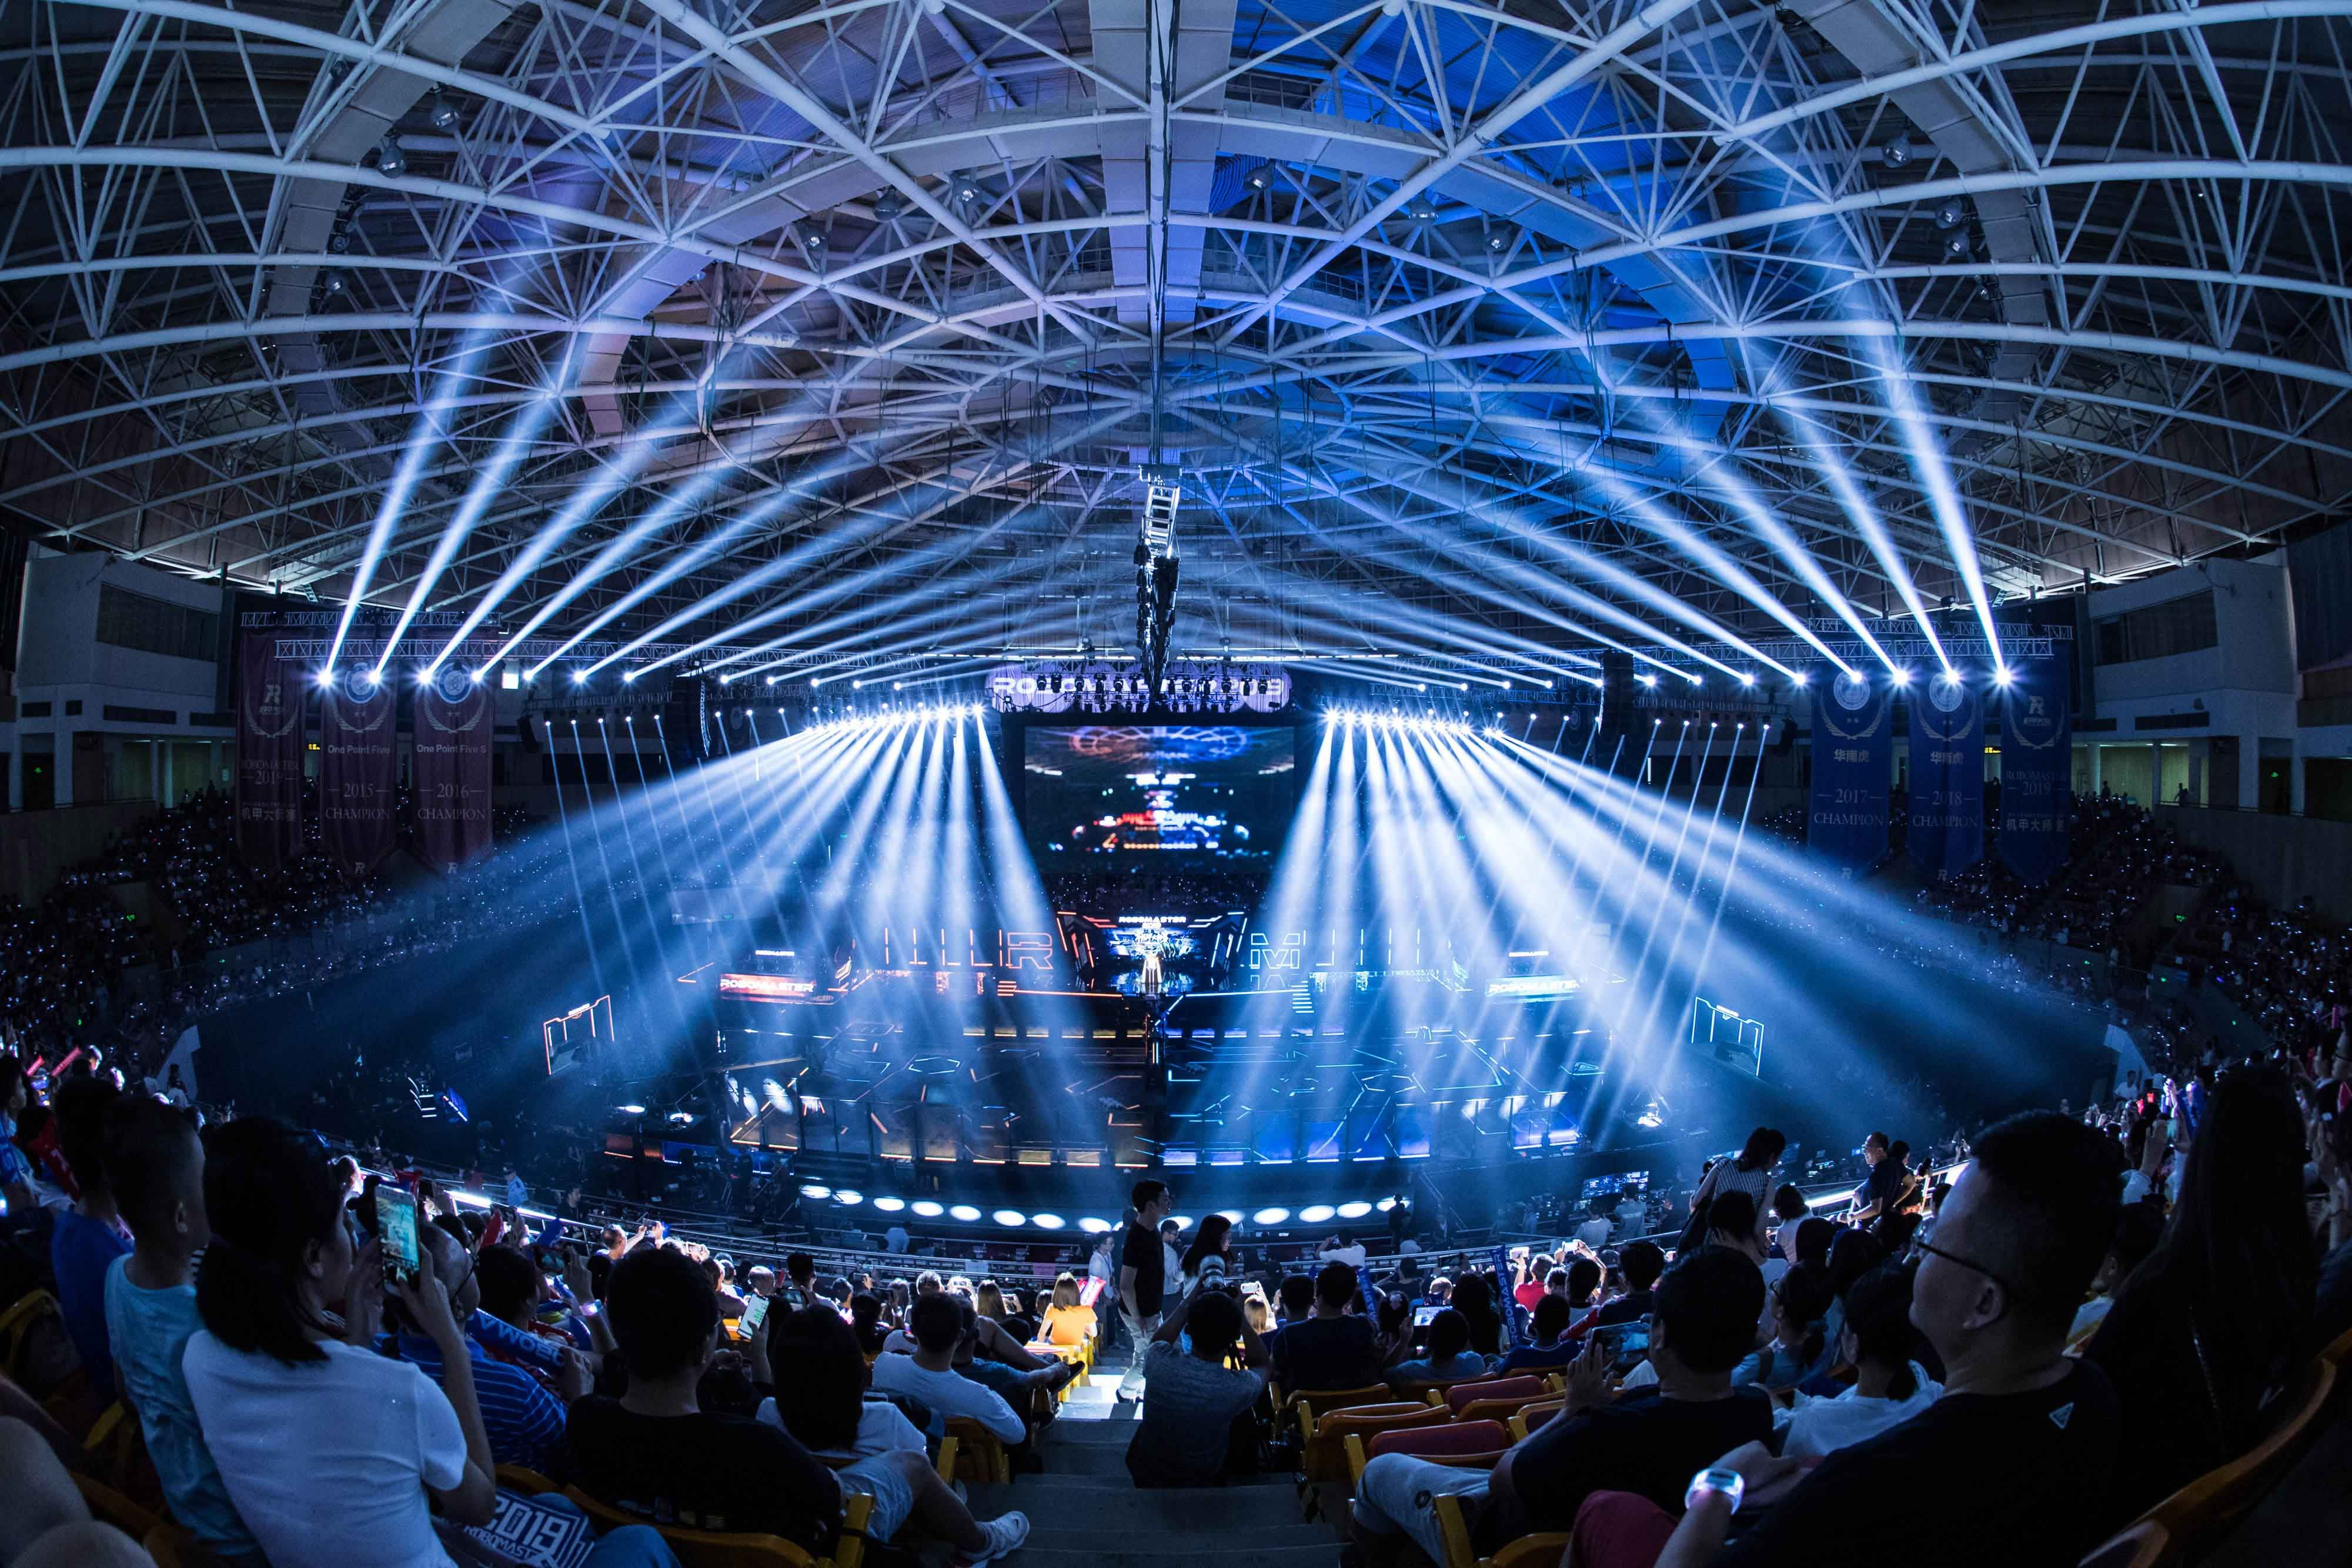 The 2019 RoboMaster Arena